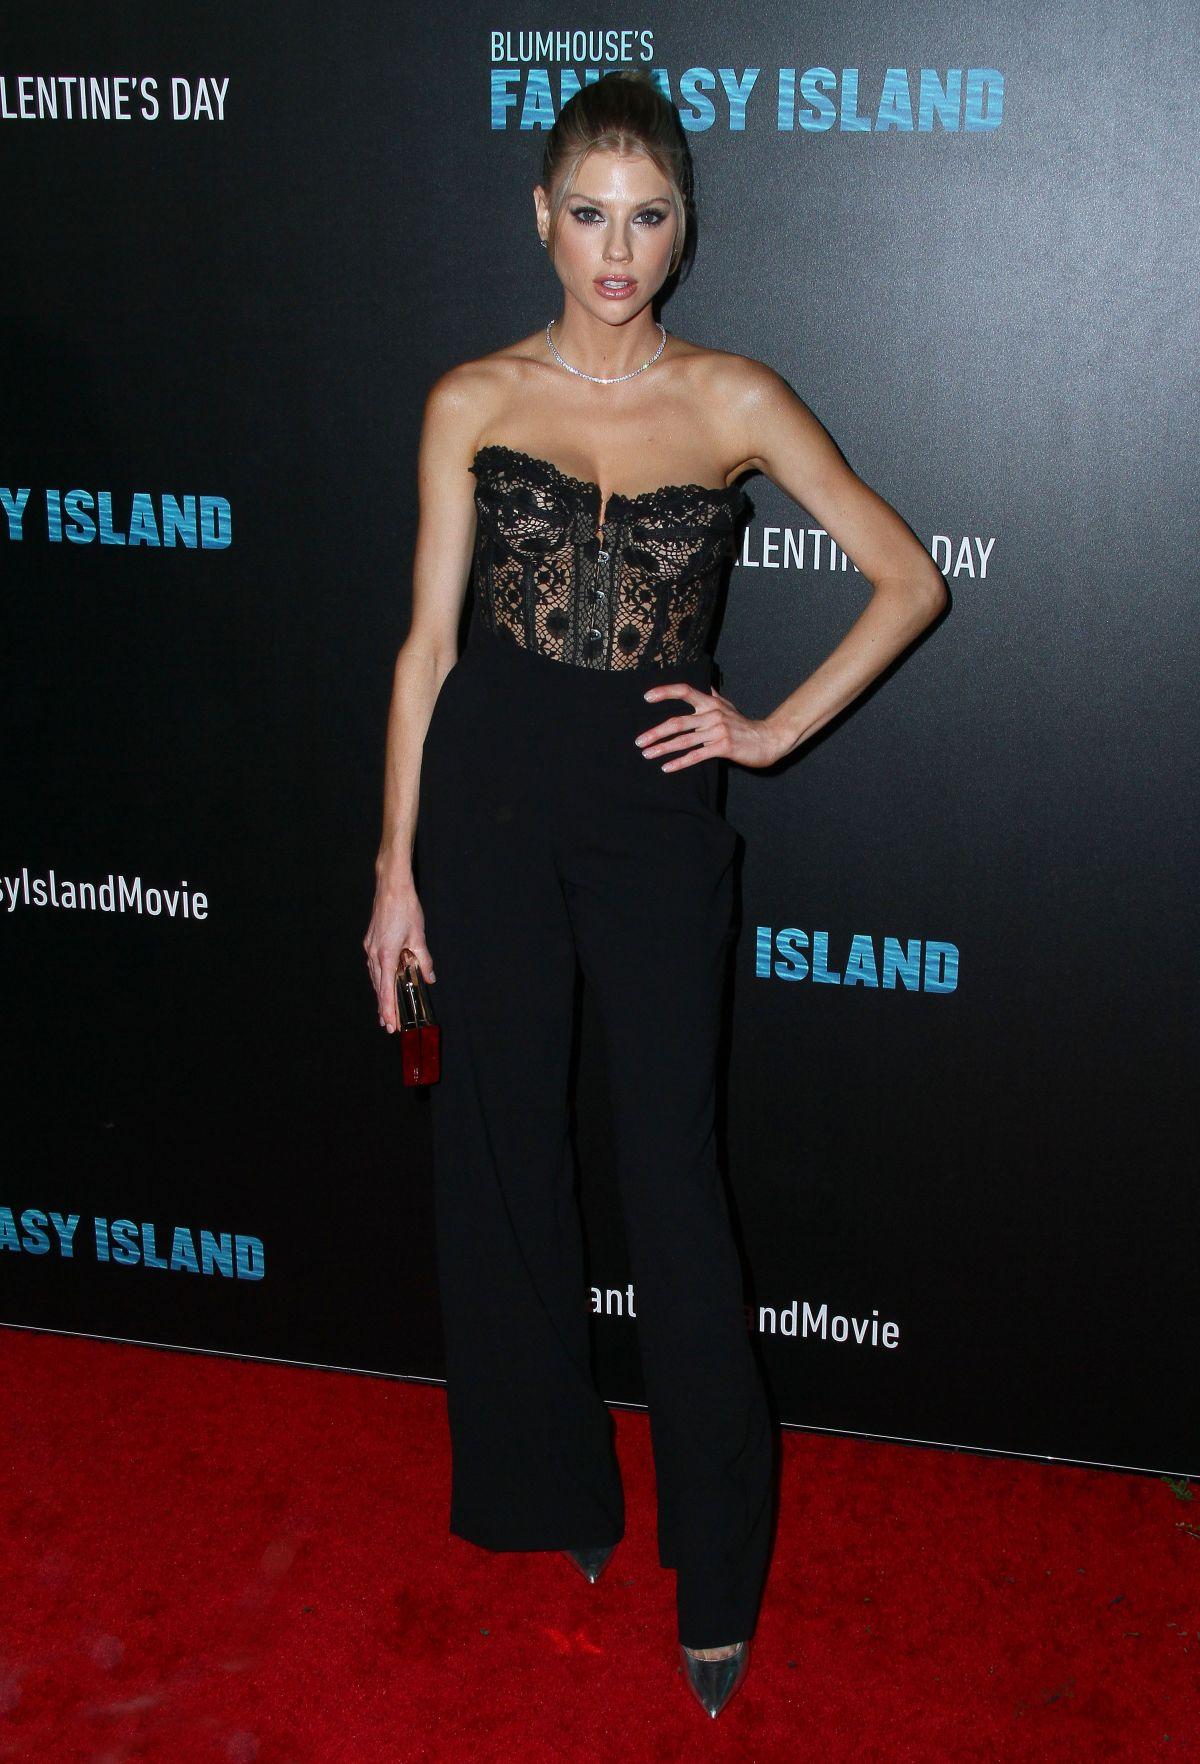 CHARLOTTE MCKINNEY at Fantasy Island Premiere in Los